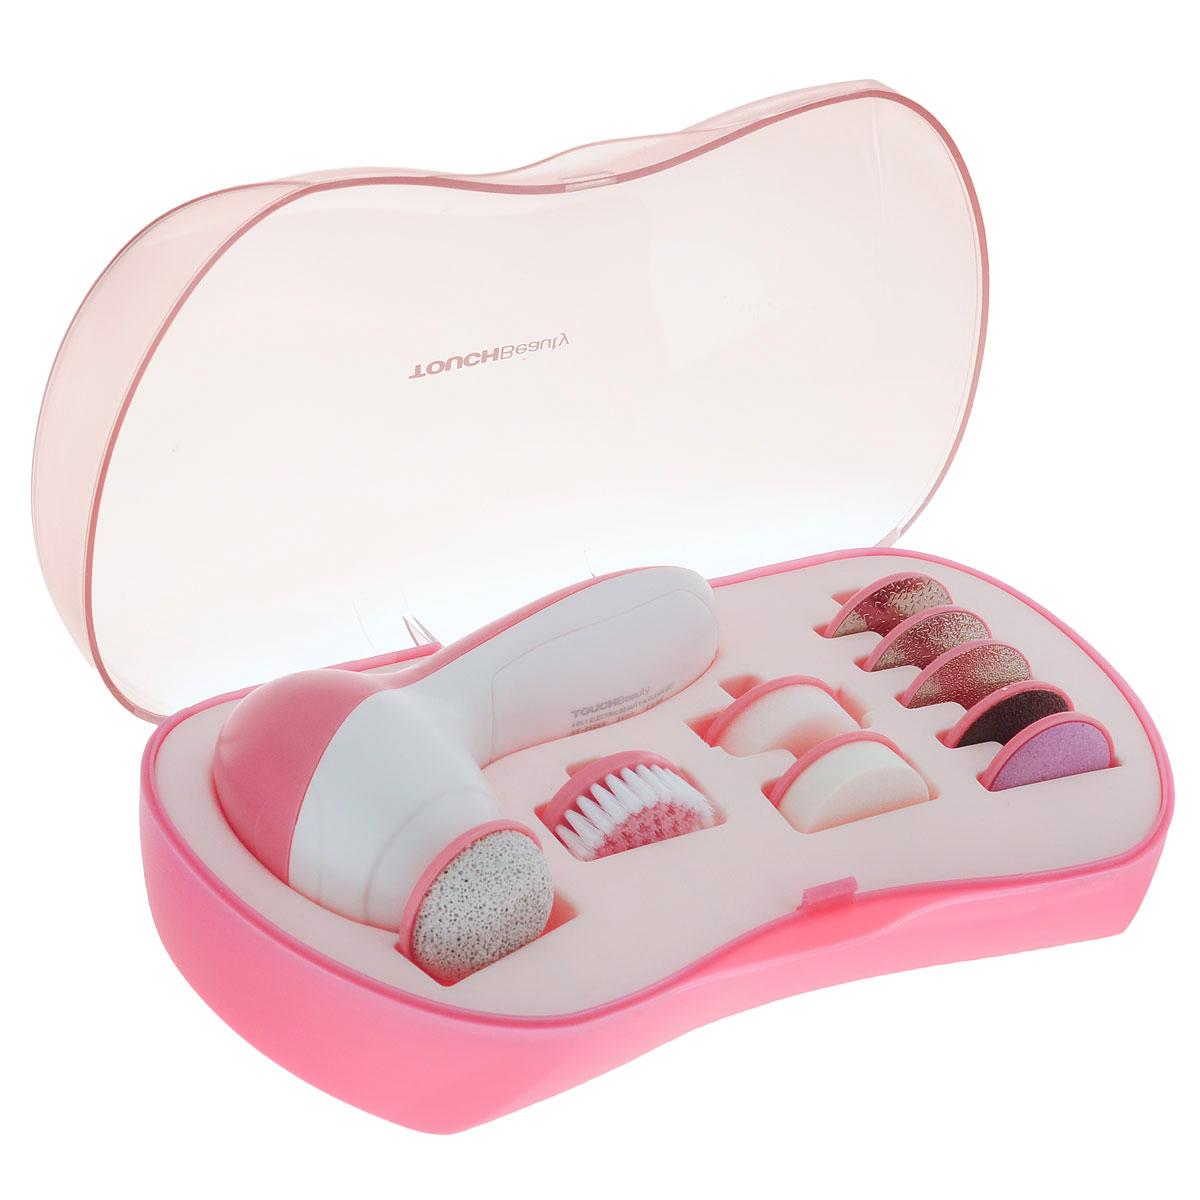 Touchbeauty Педикюрный набор 9в1 Electric Beauty & Clean Set. AS-0601B педикюрный набор touchbeauty as 0601b